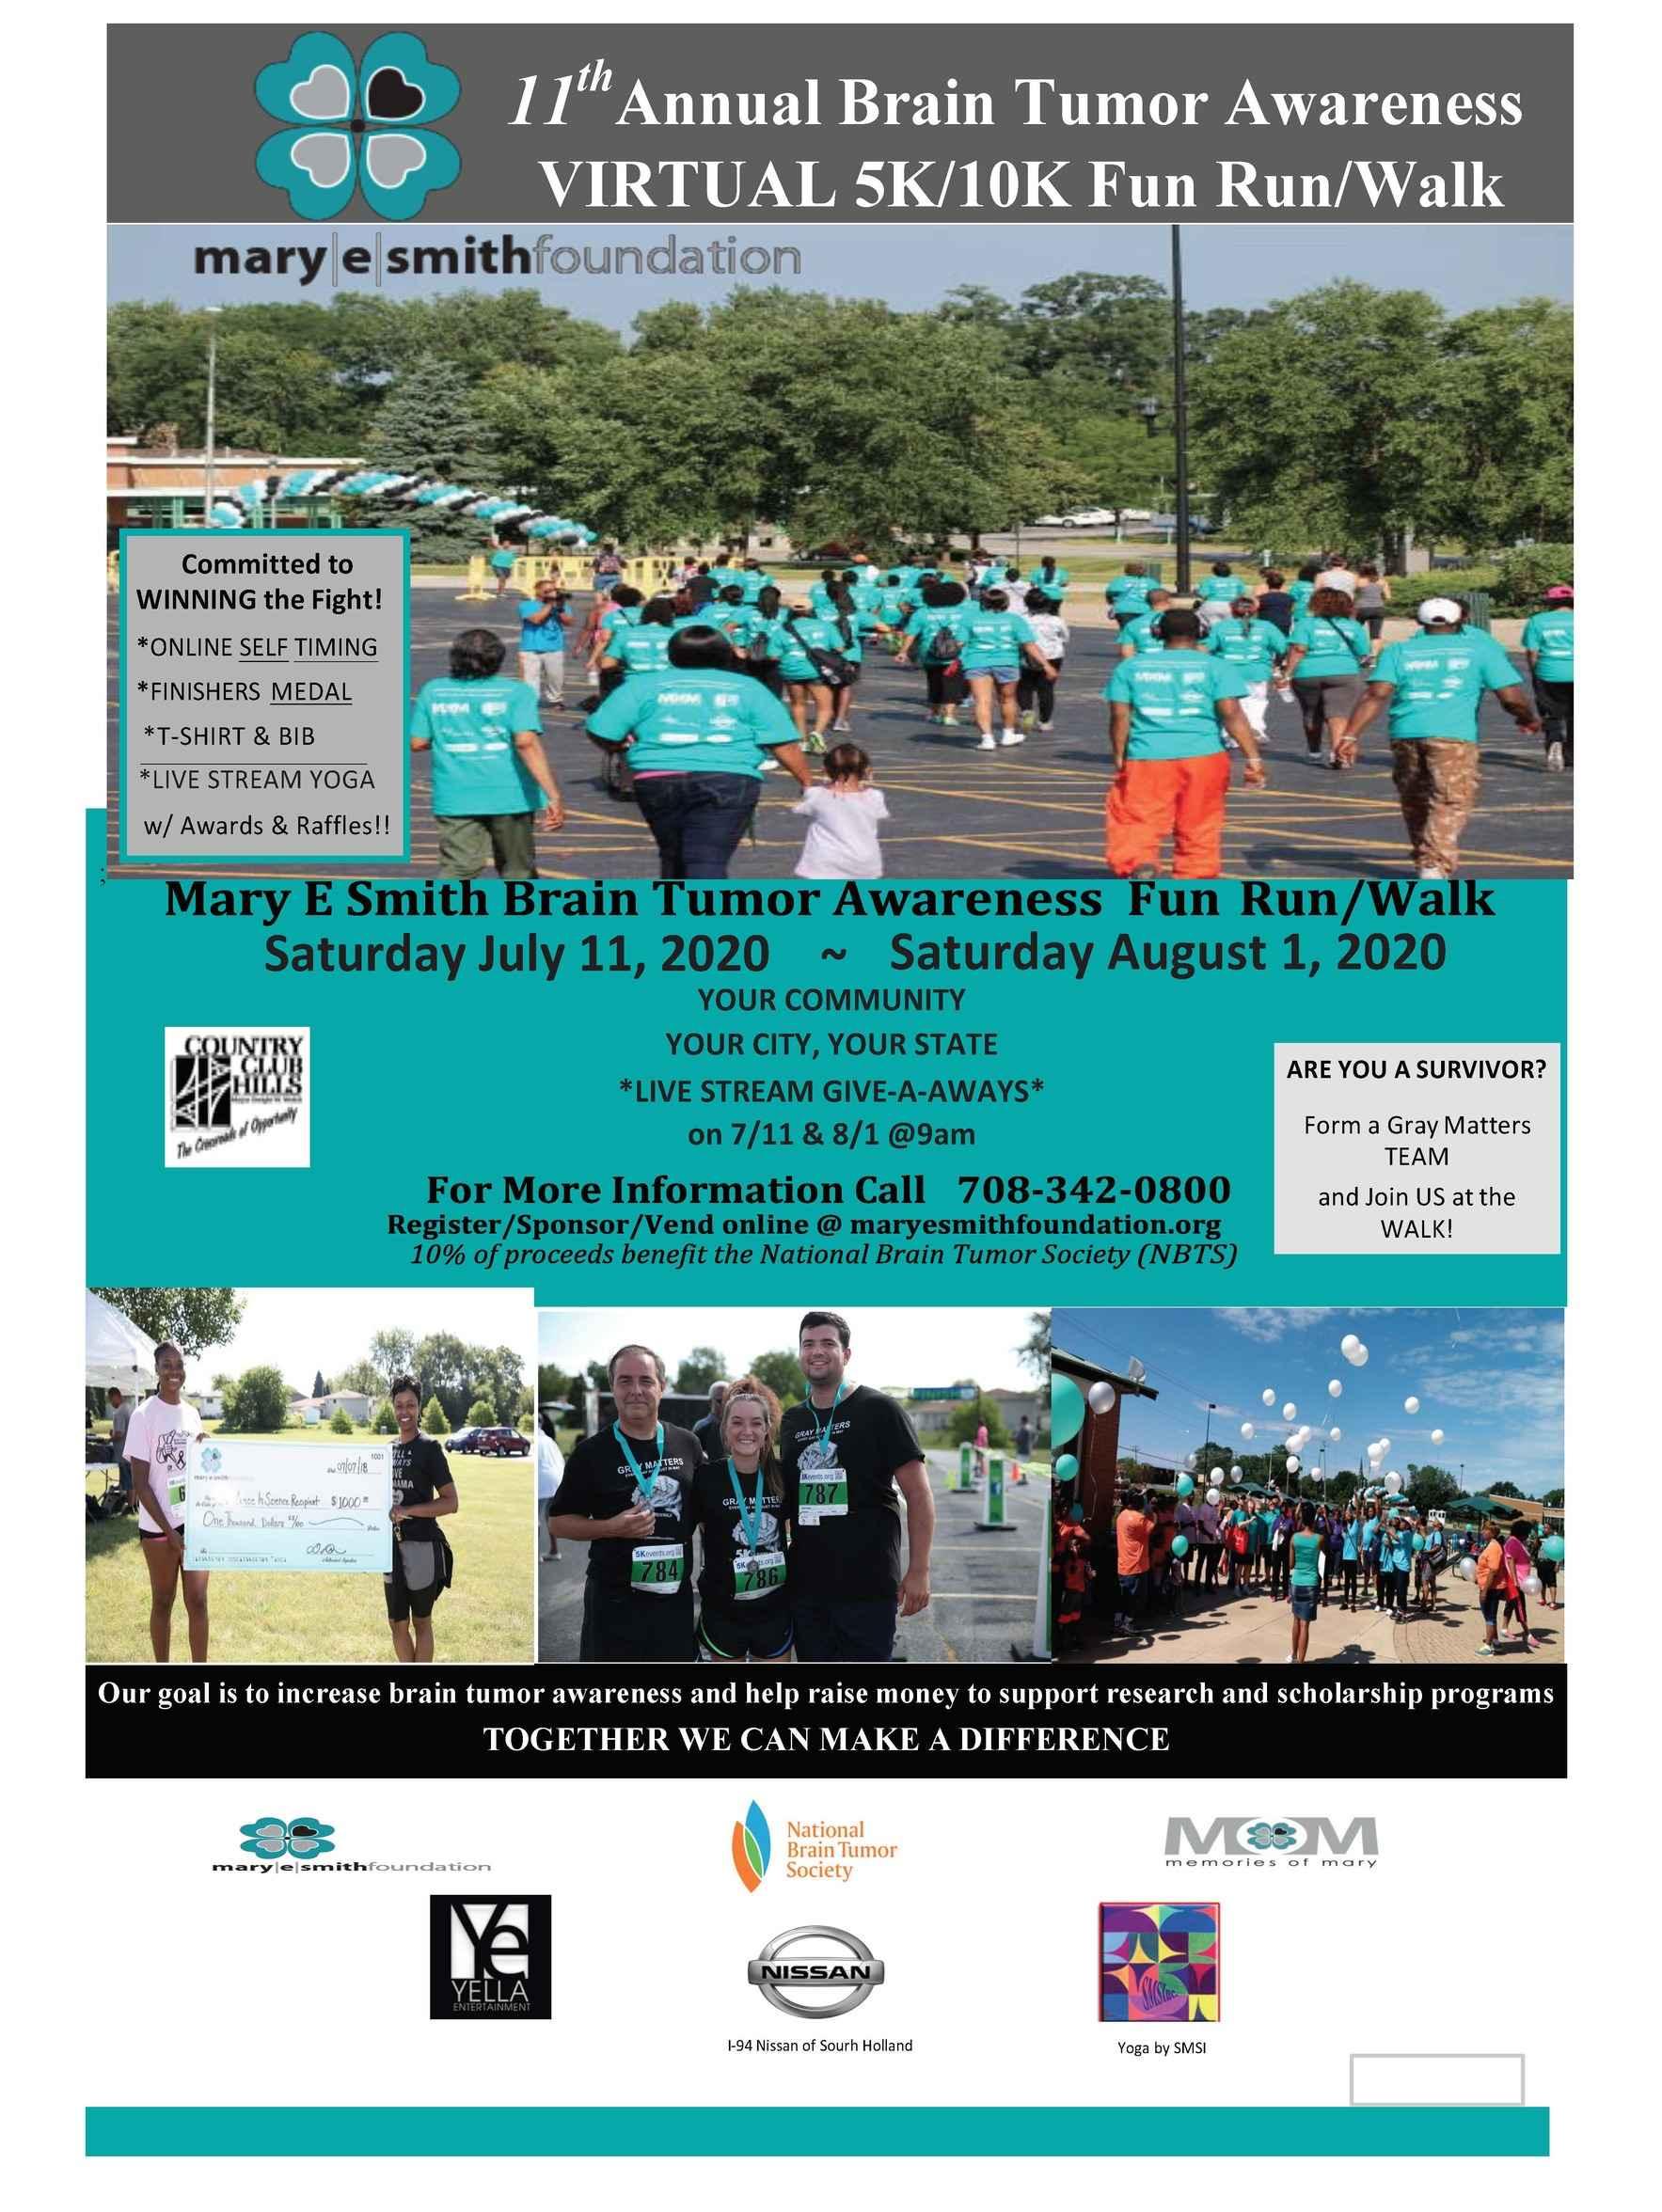 11th Mary E. Smith Brain Tumor Awareness VIRTUAL 5K/10K Fun Run/Walk image